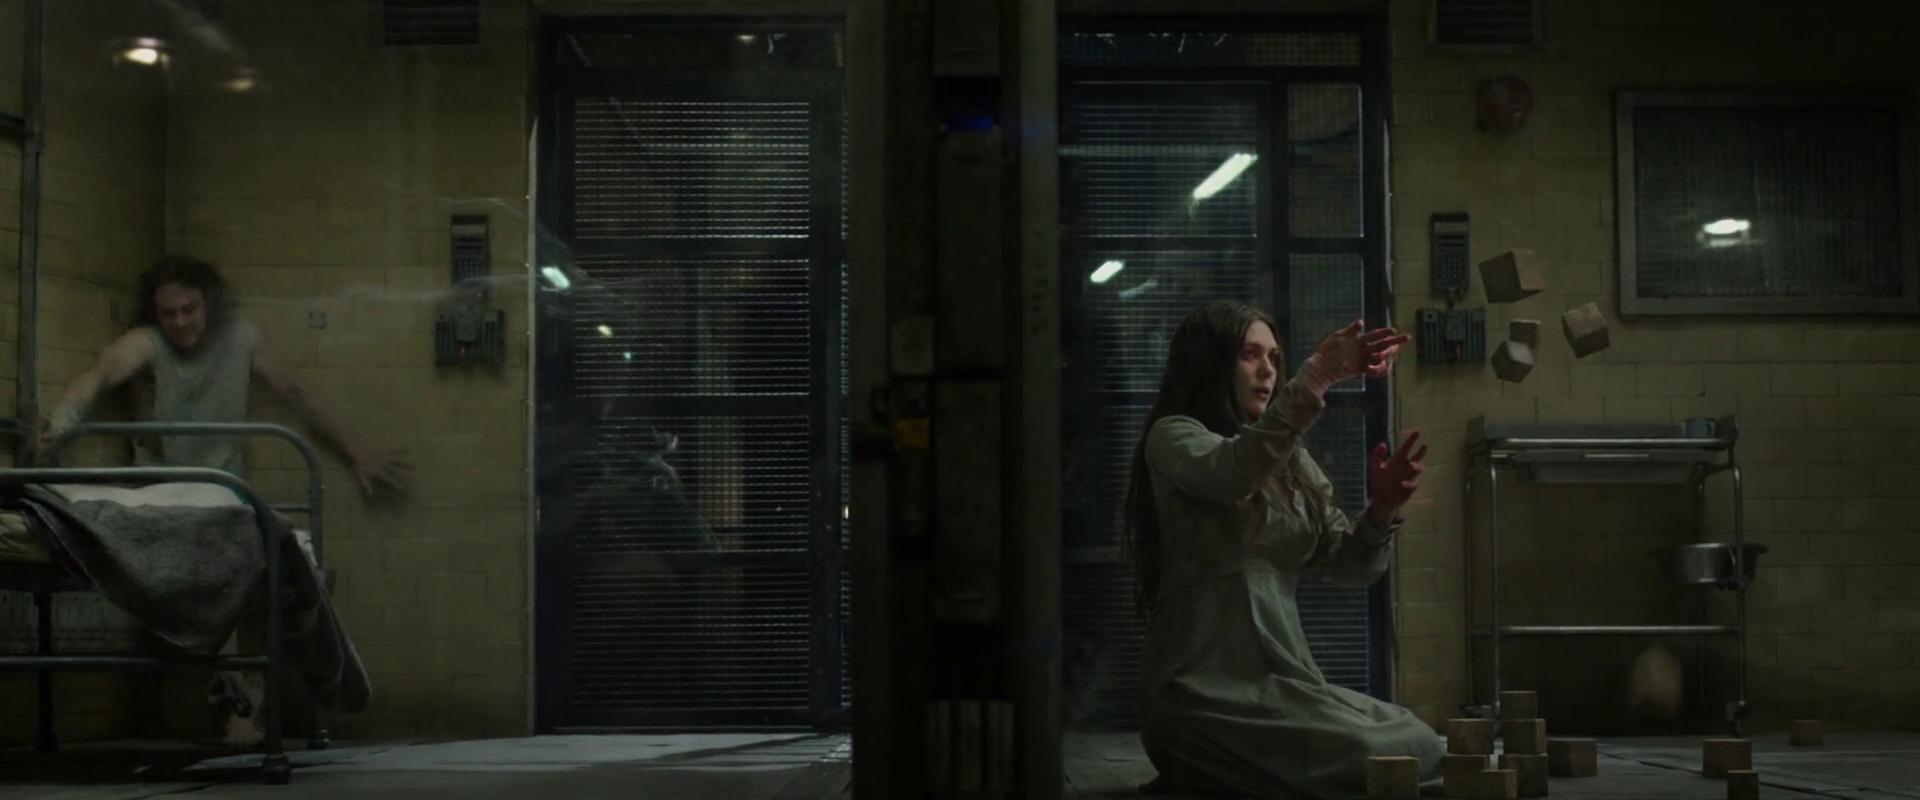 Captain America: The Winter Soldier: Aaron Taylor-Johnson ed Elizabeth Olsen nella scena mid-credits